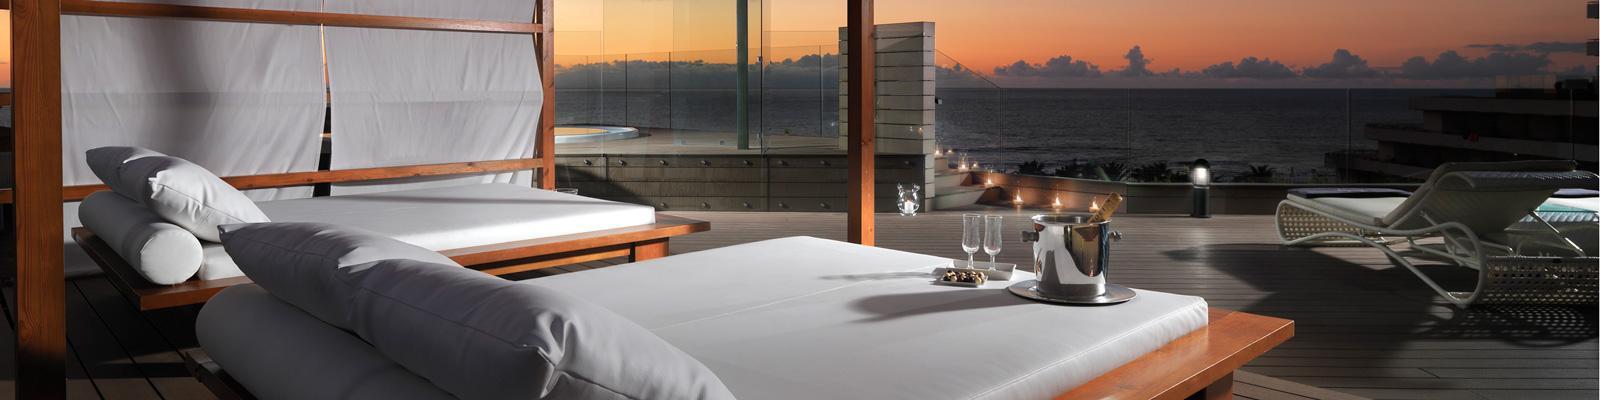 H10 Conquistador Tenerife - Las Americas Hotel